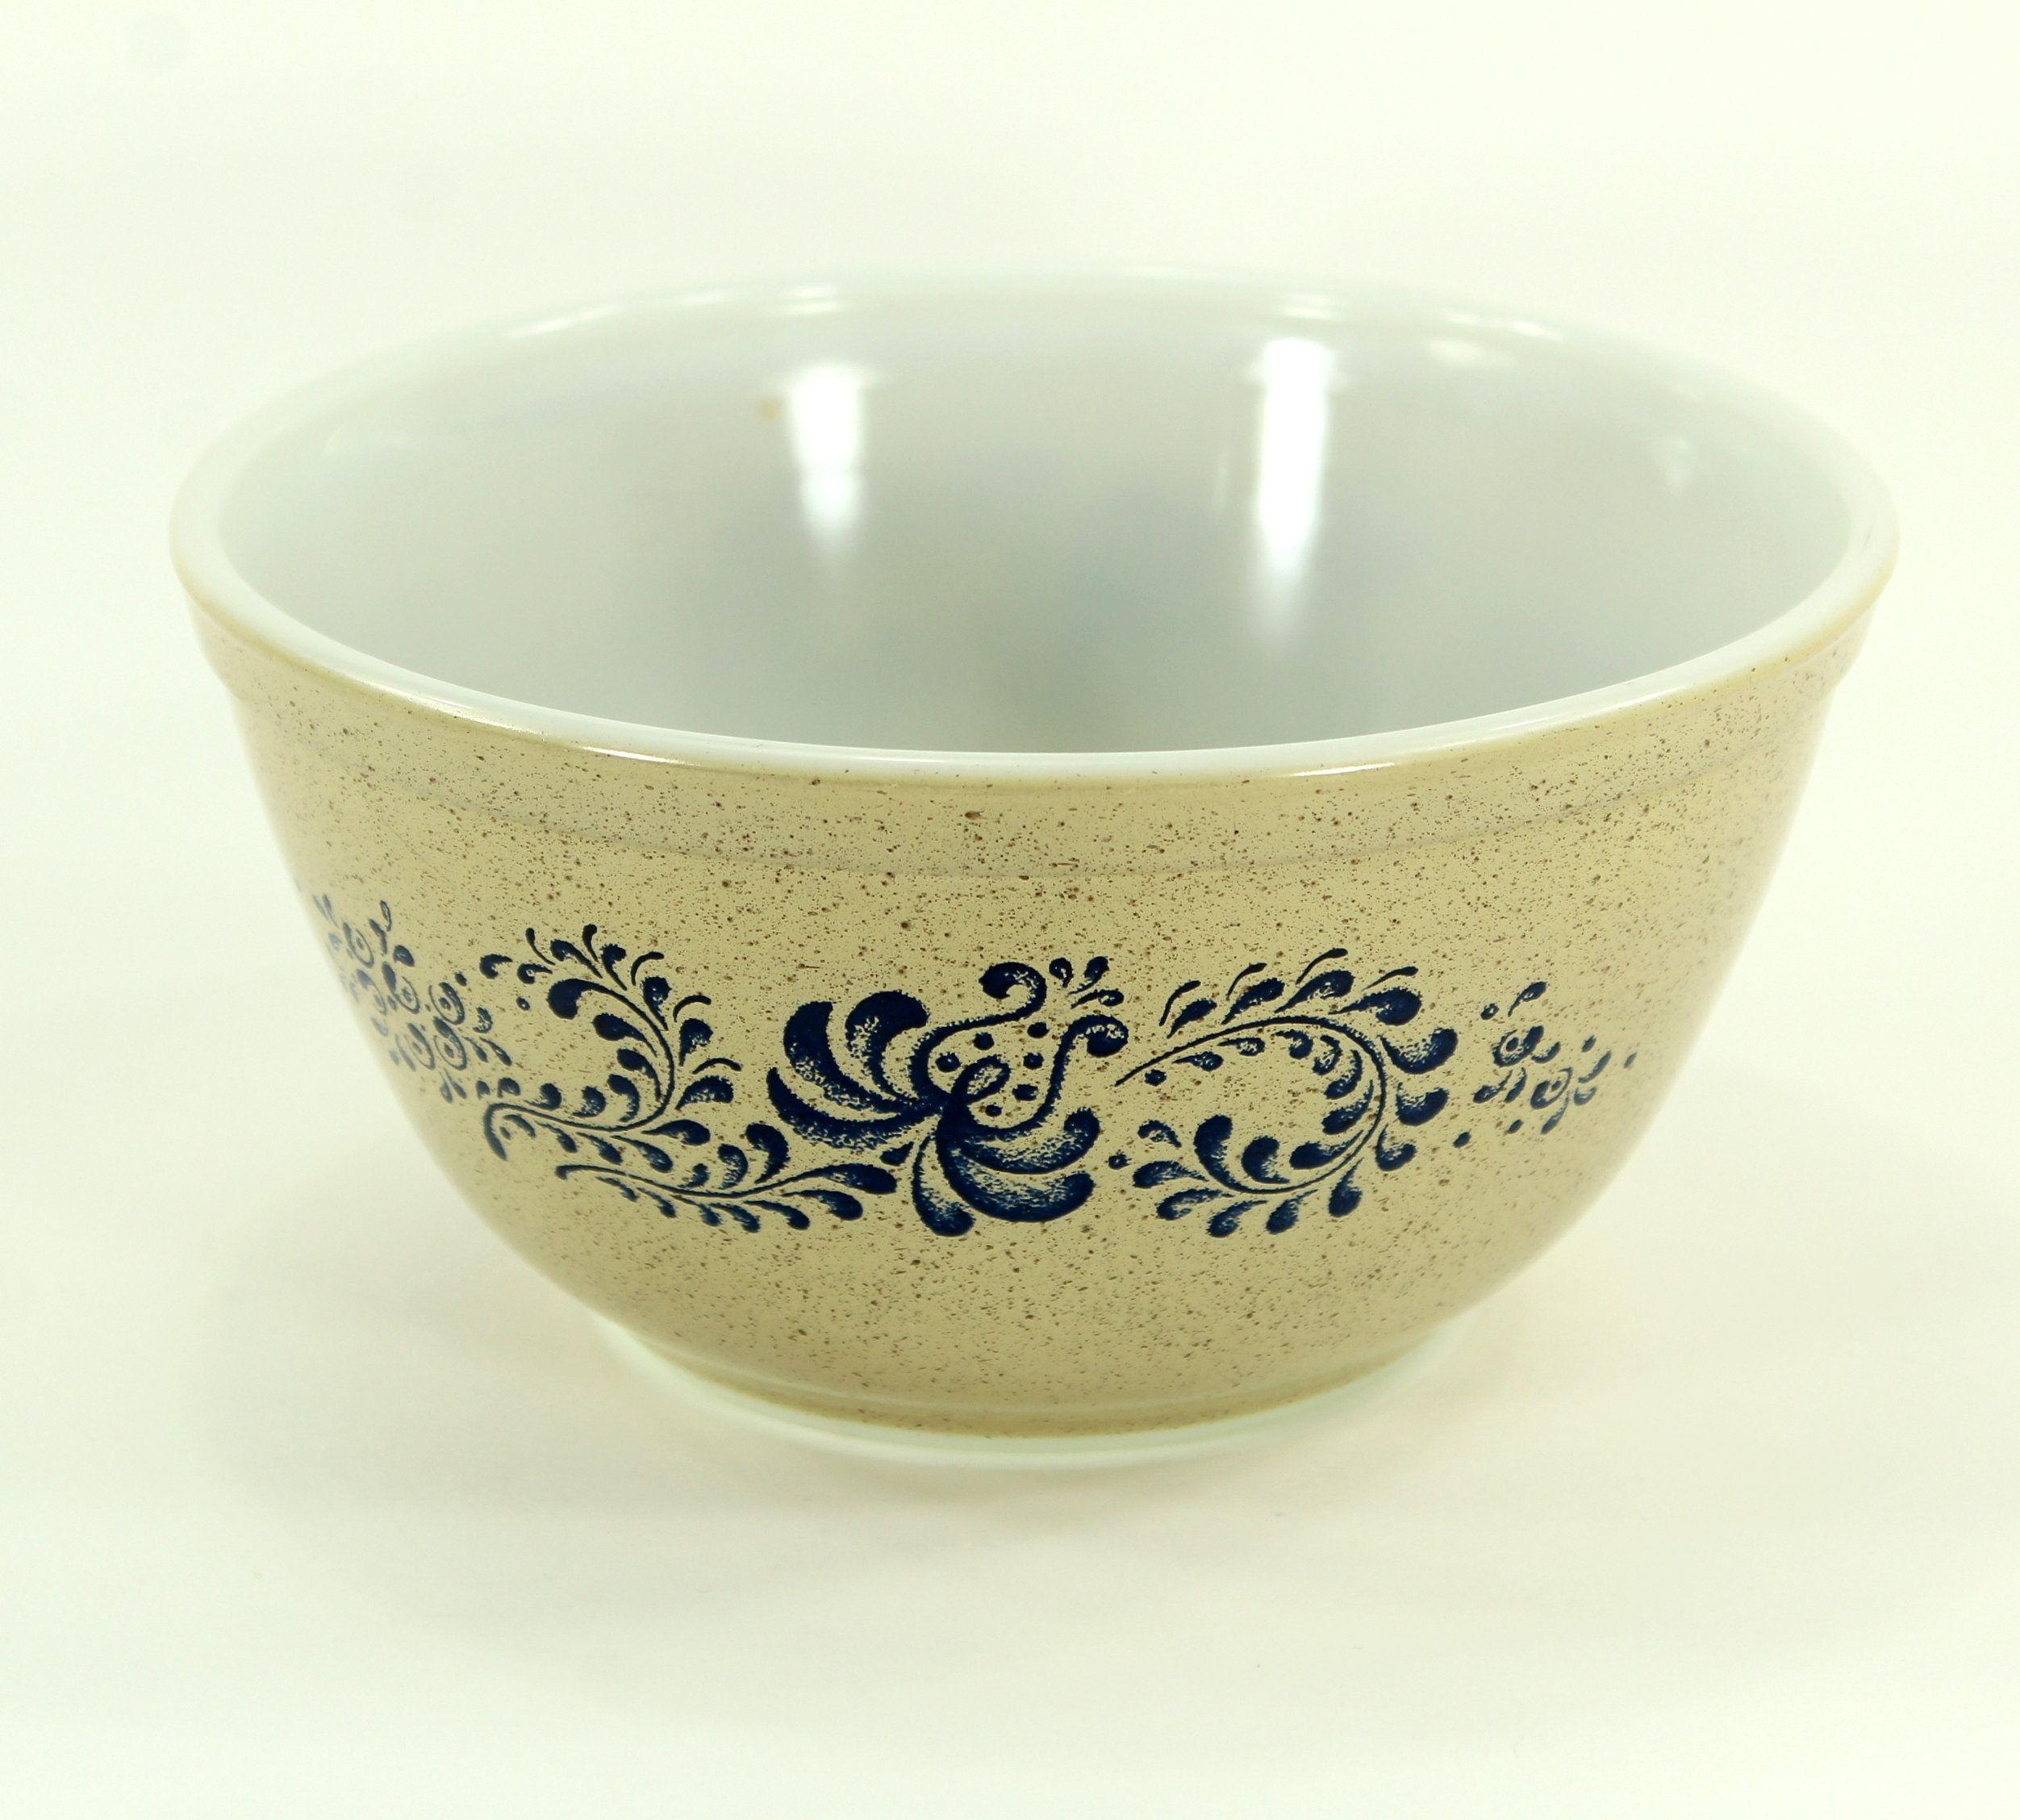 Pyrex Homestead Medium Mixing Bowl, # 402, 1 1/2 Quart, Vintage Kitchenware #vintagekitchenware